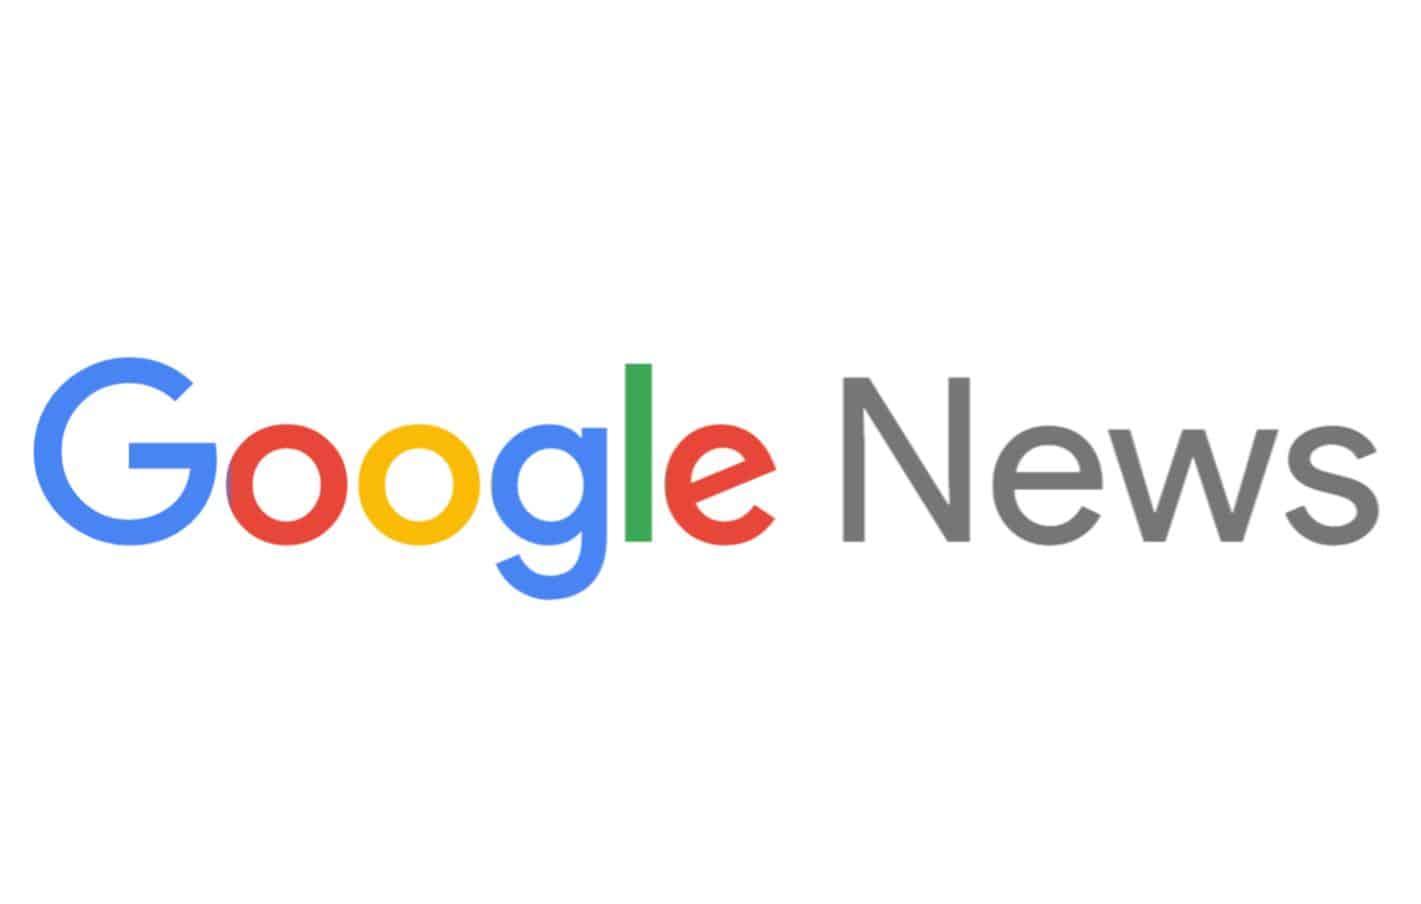 تابعنا على جوجل نيوز